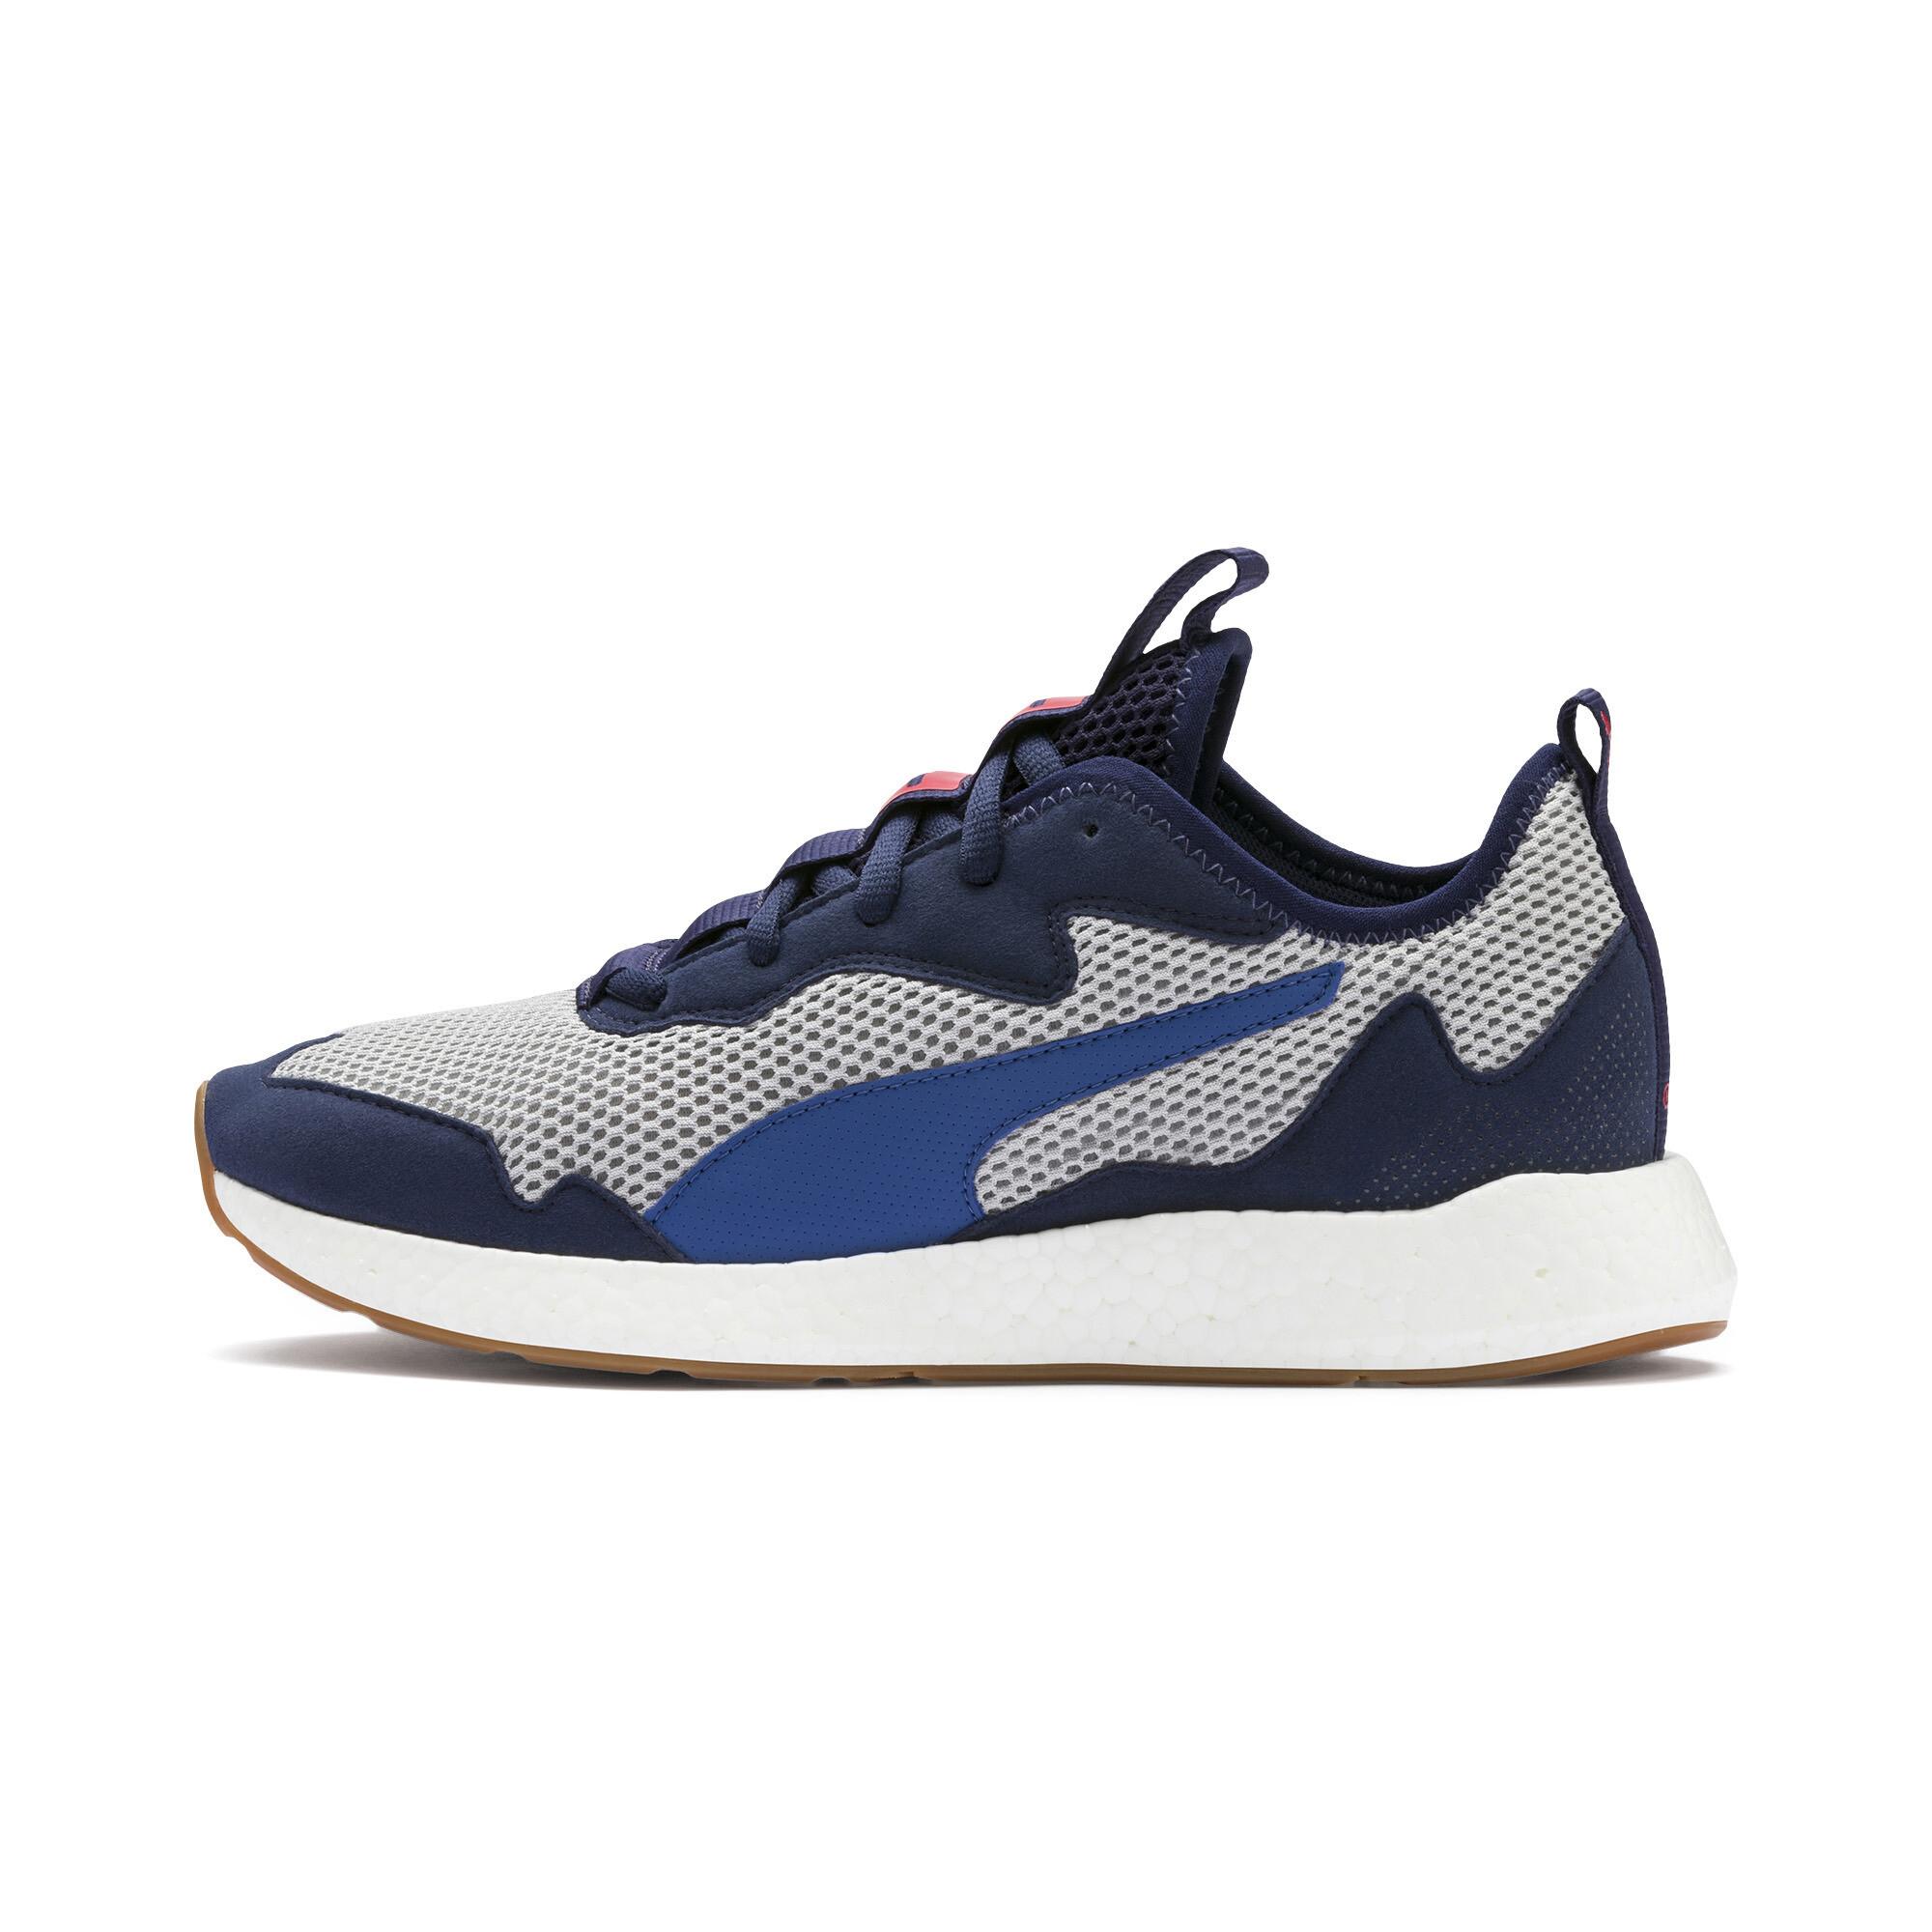 PUMA-NRGY-Neko-Skim-Men-s-Running-Shoes-Men-Shoe-Running thumbnail 14